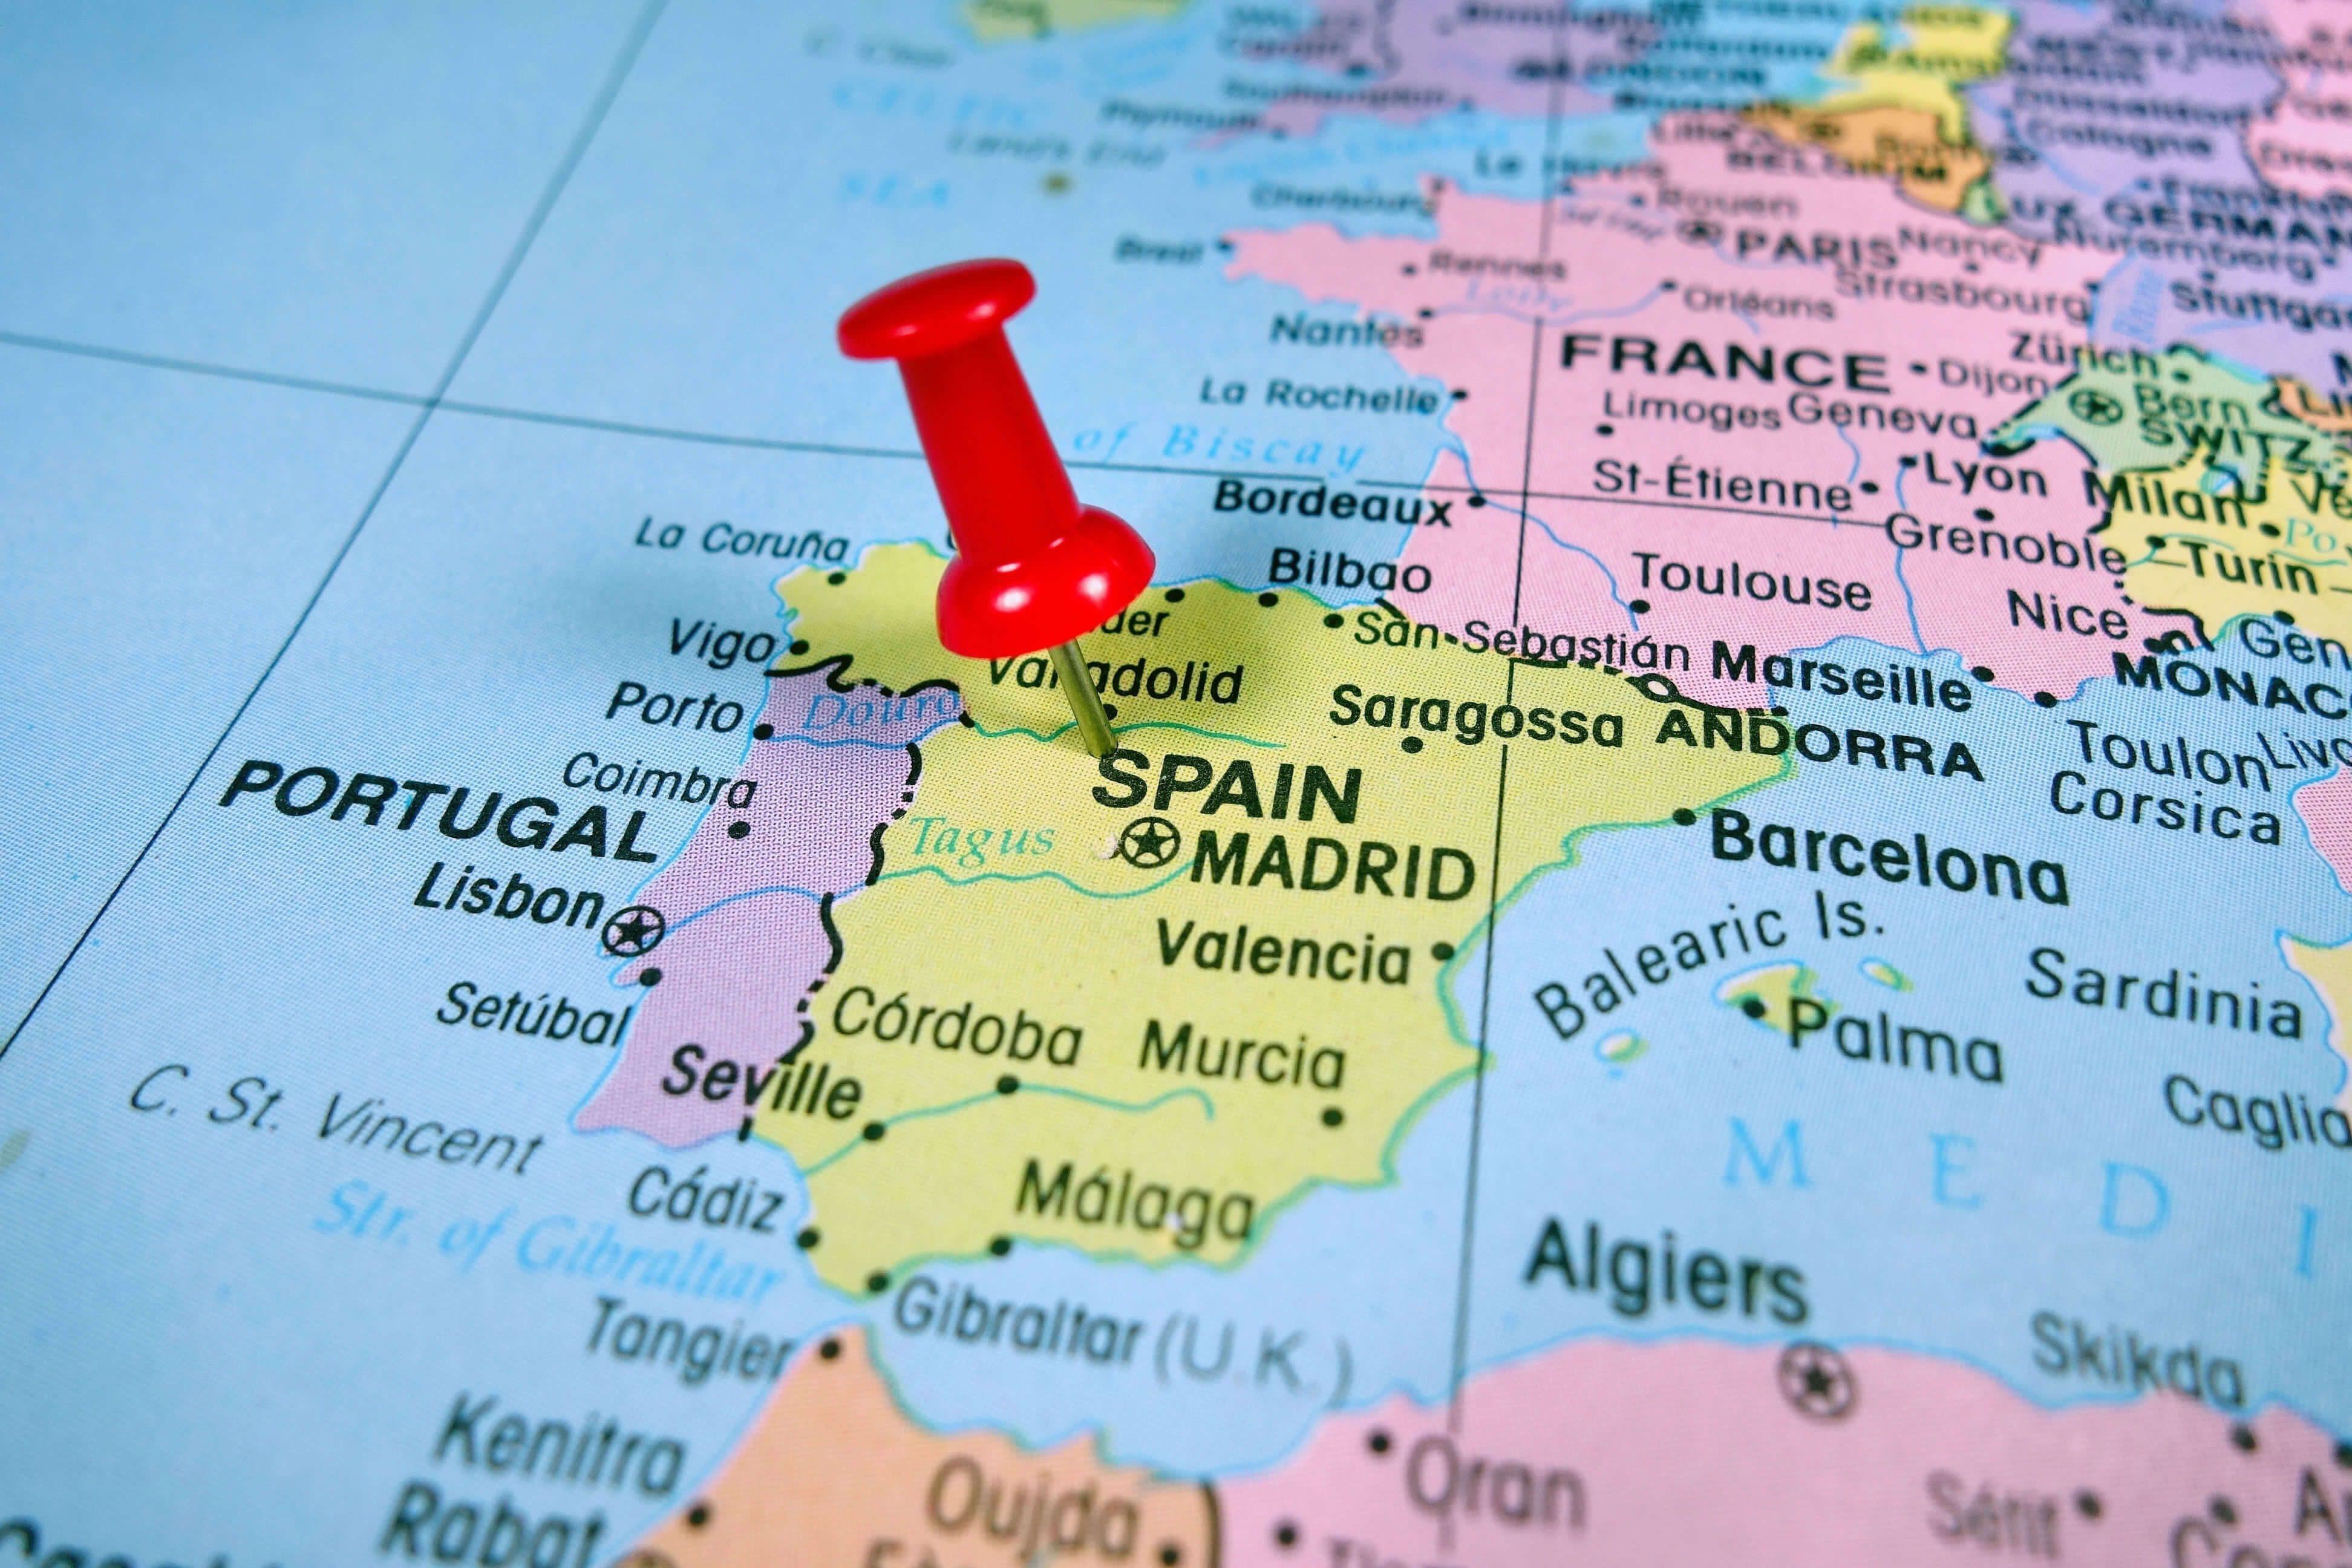 Pushpin Marking on Spain Map